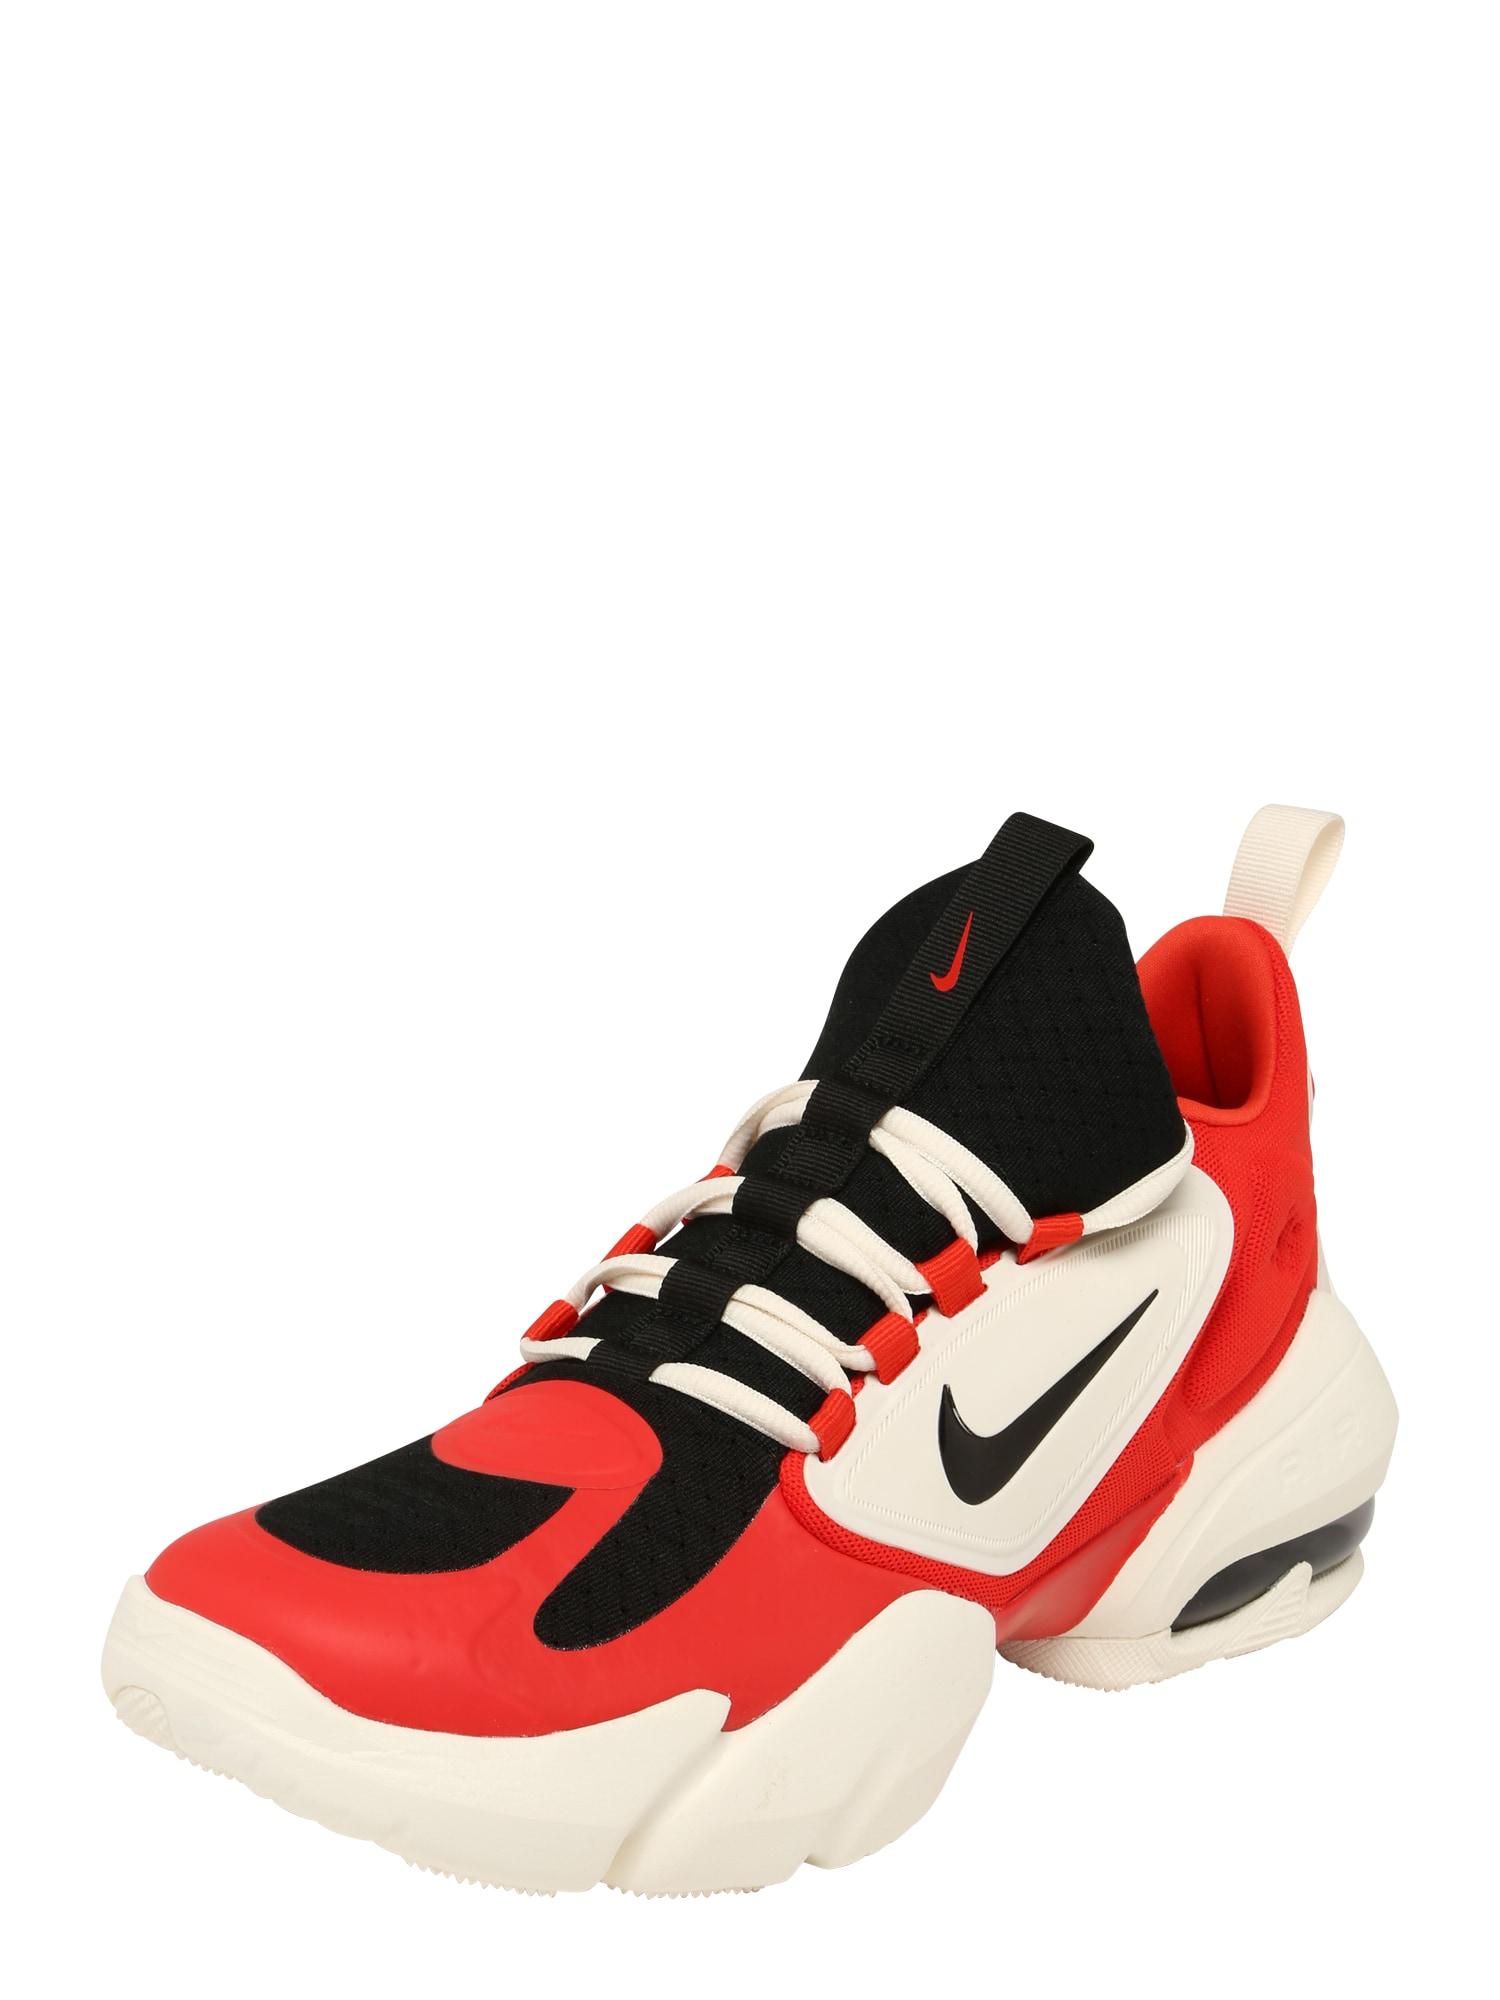 Běžecká obuv Air Max Alpha Savage červená černá bílá NIKE